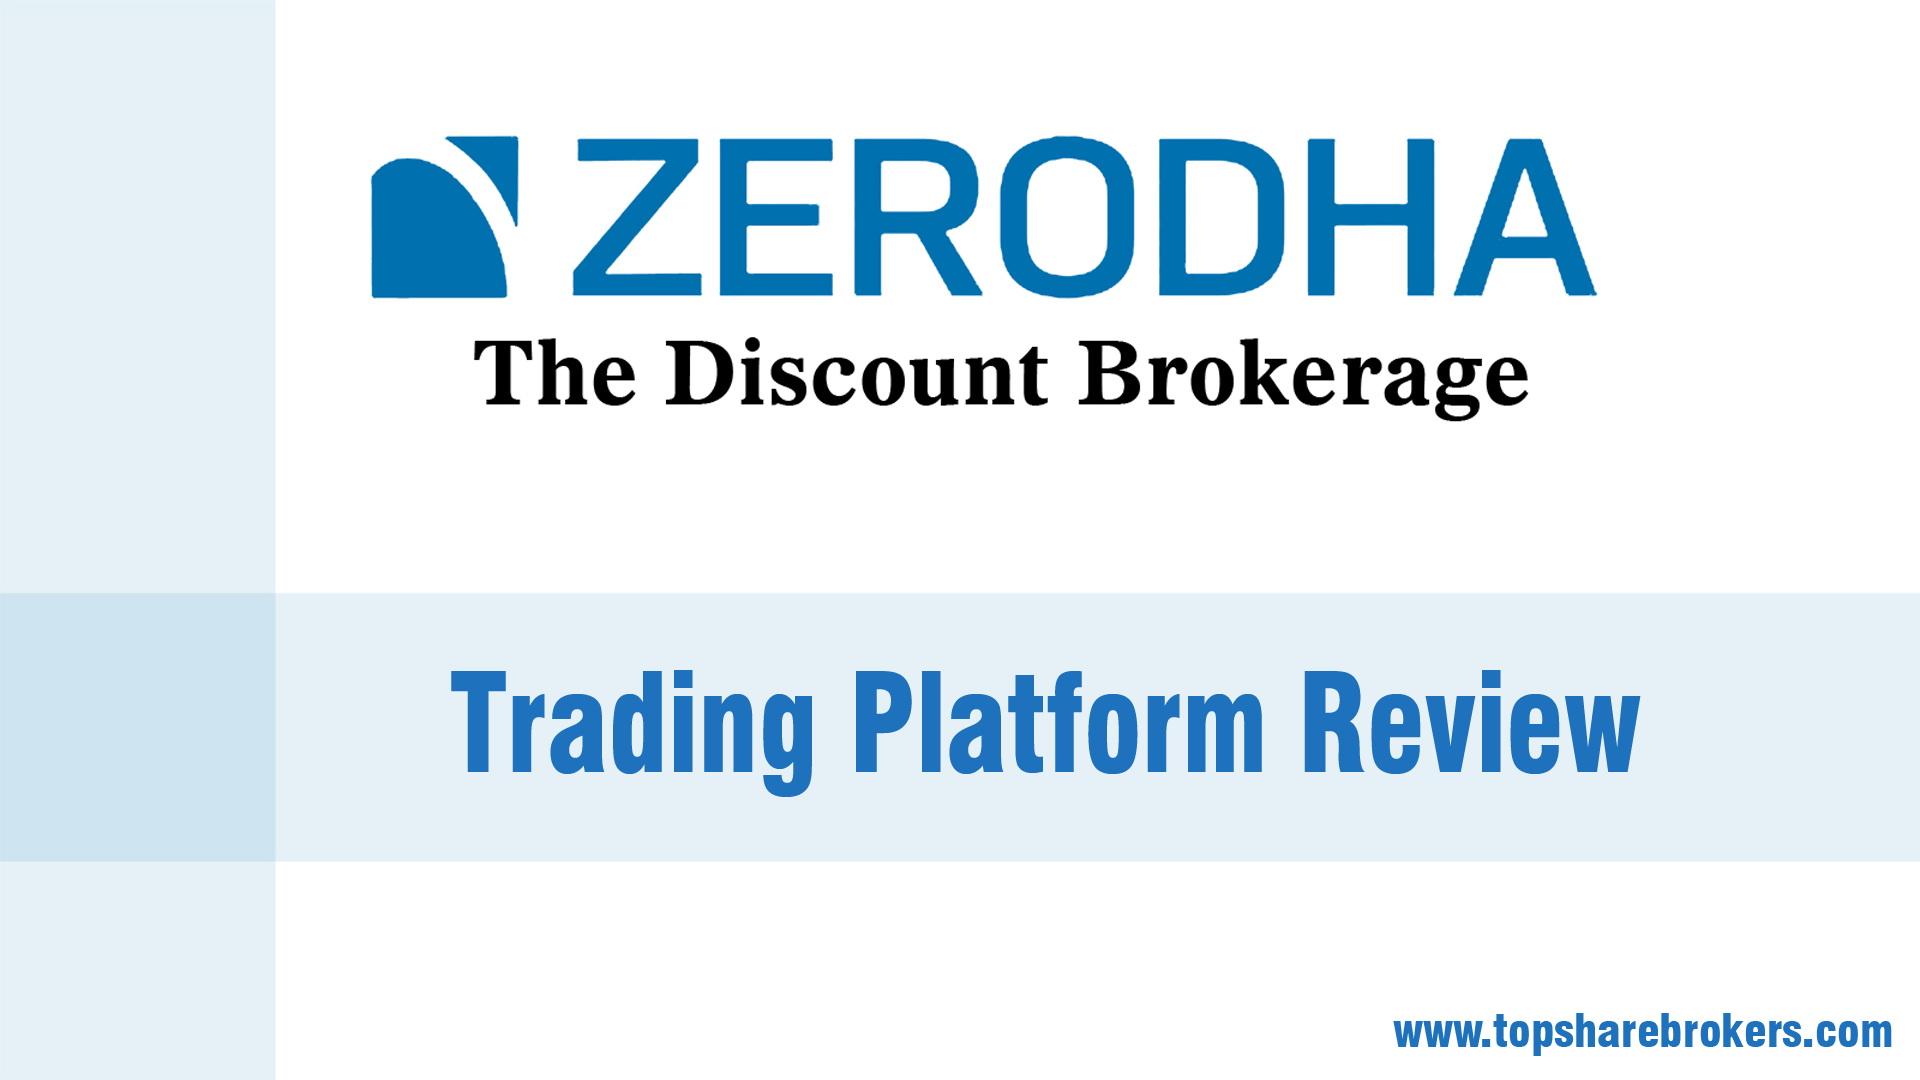 Does Zerodha provide forex trading? - Quora